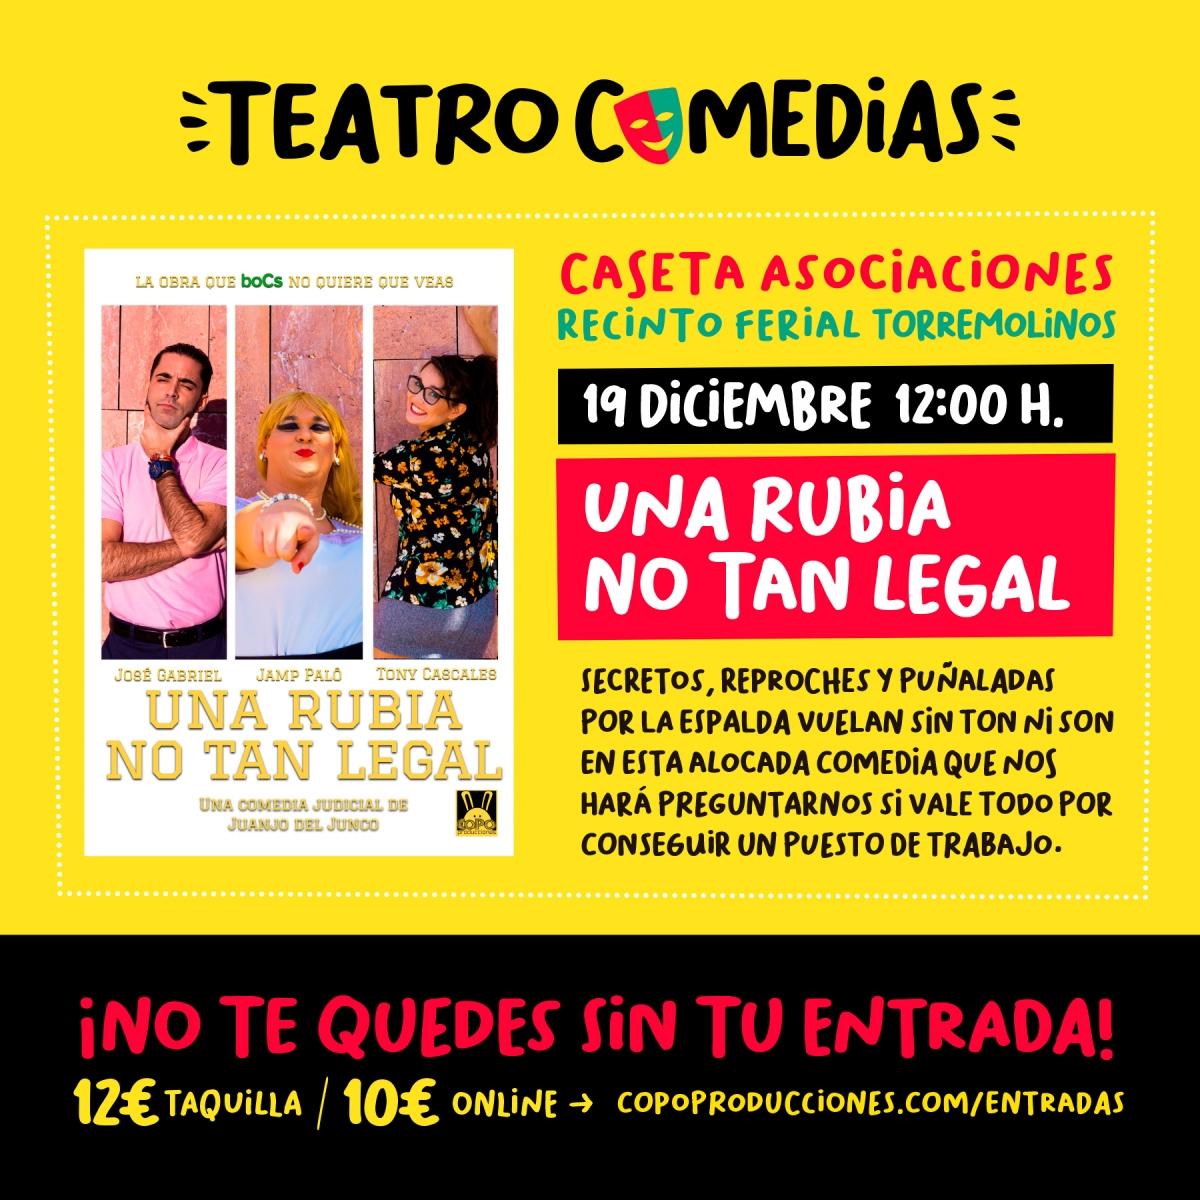 20201217102323_news_9_i-ciclo-teatro-comedias-rrss-3.jpg